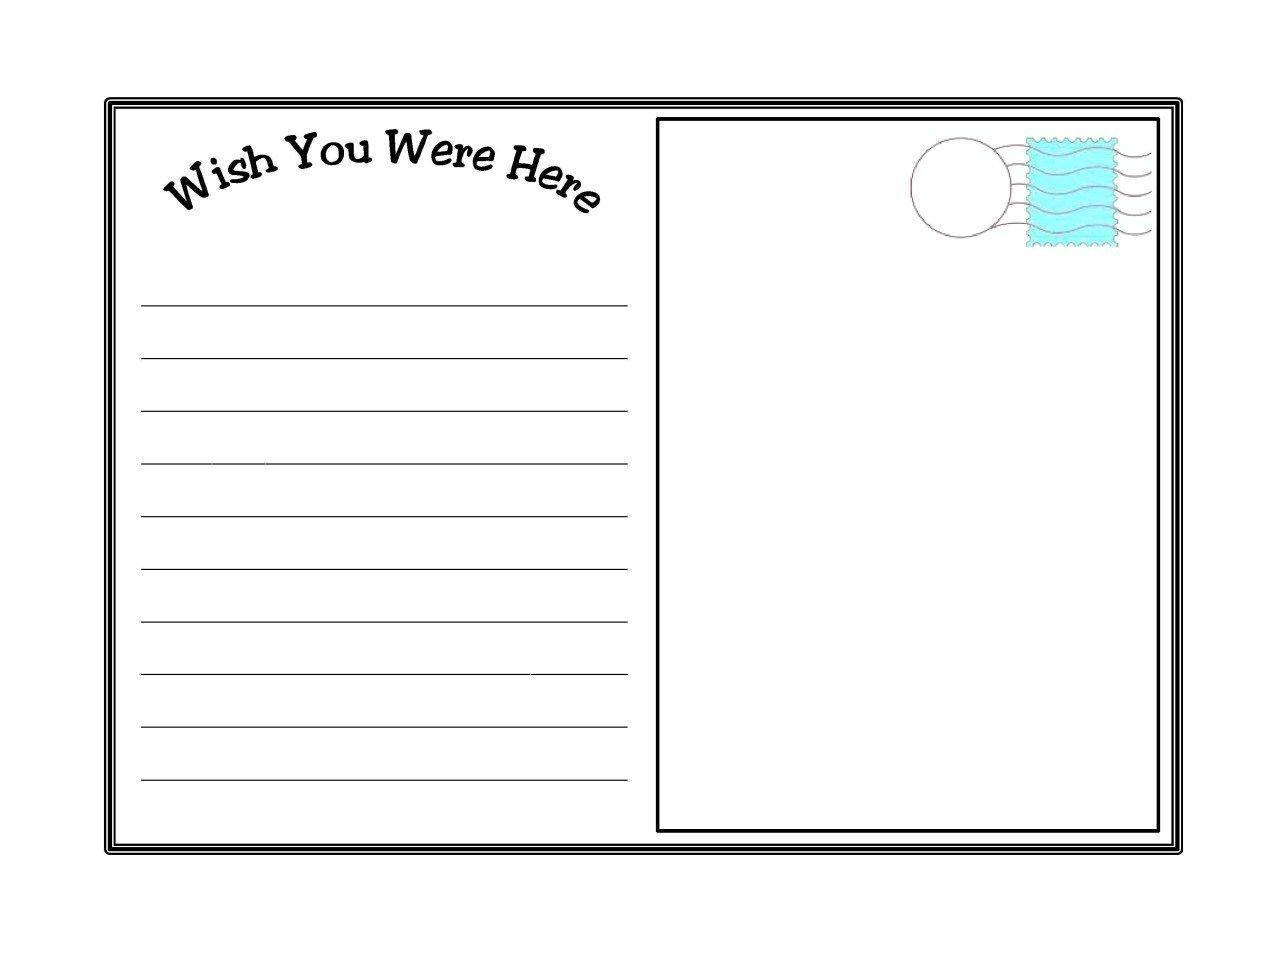 010 Template Ideas Free Printable Postcard Runticino Pertaining To Free Blank Postcard Template Fo Postcard Template Printable Postcards Postcard Template Free